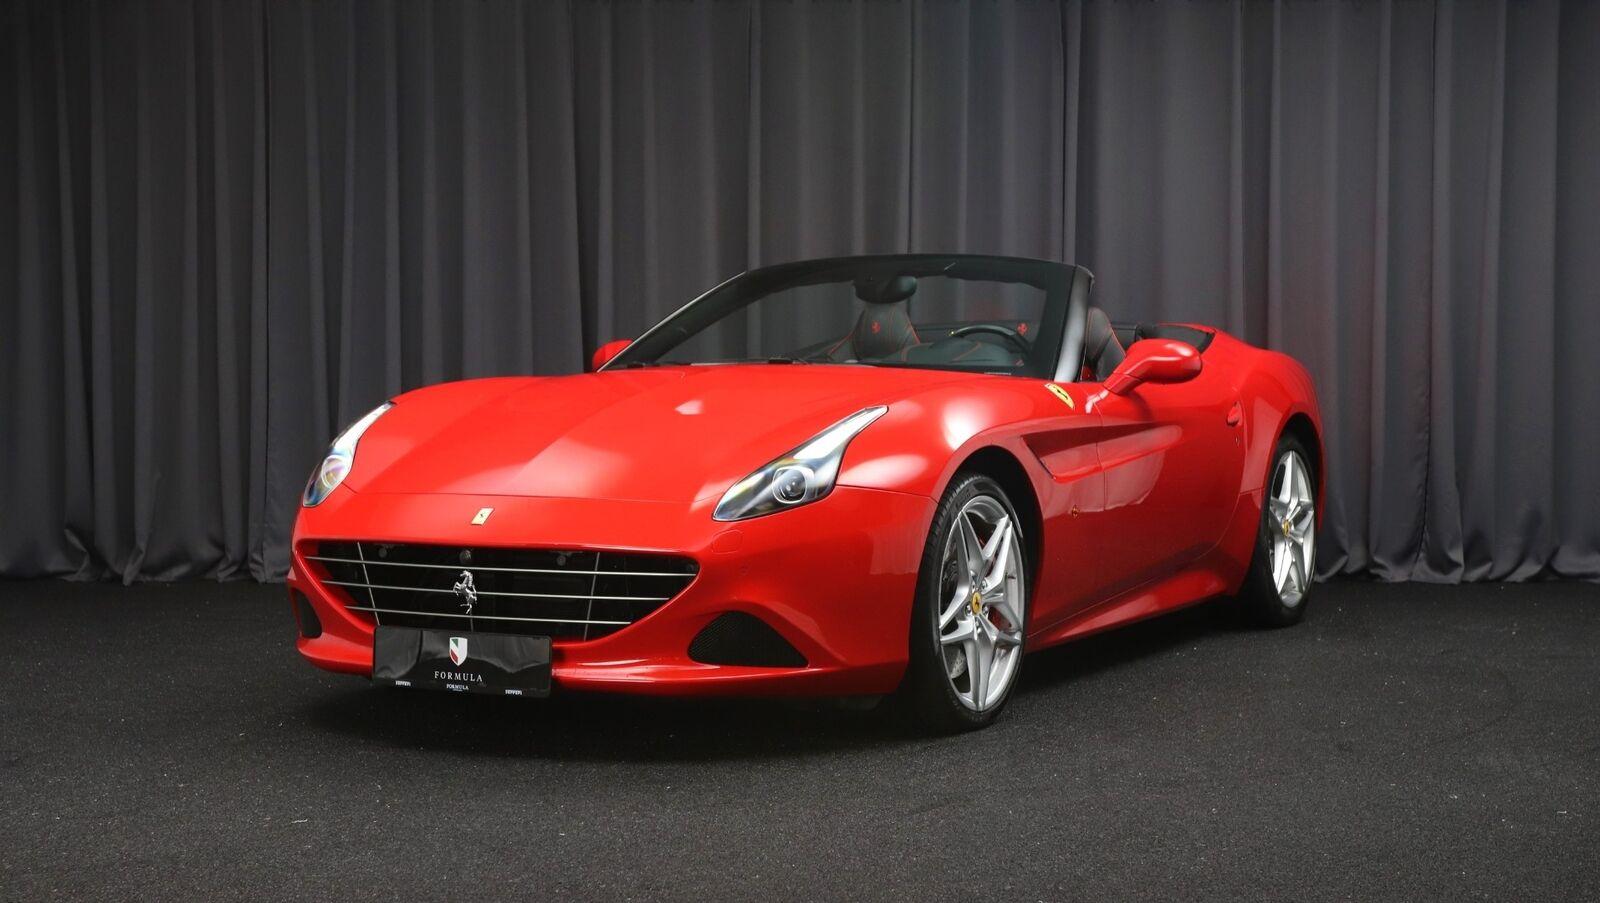 Ferrari California T 3,8 Handling Speciale F1 2d